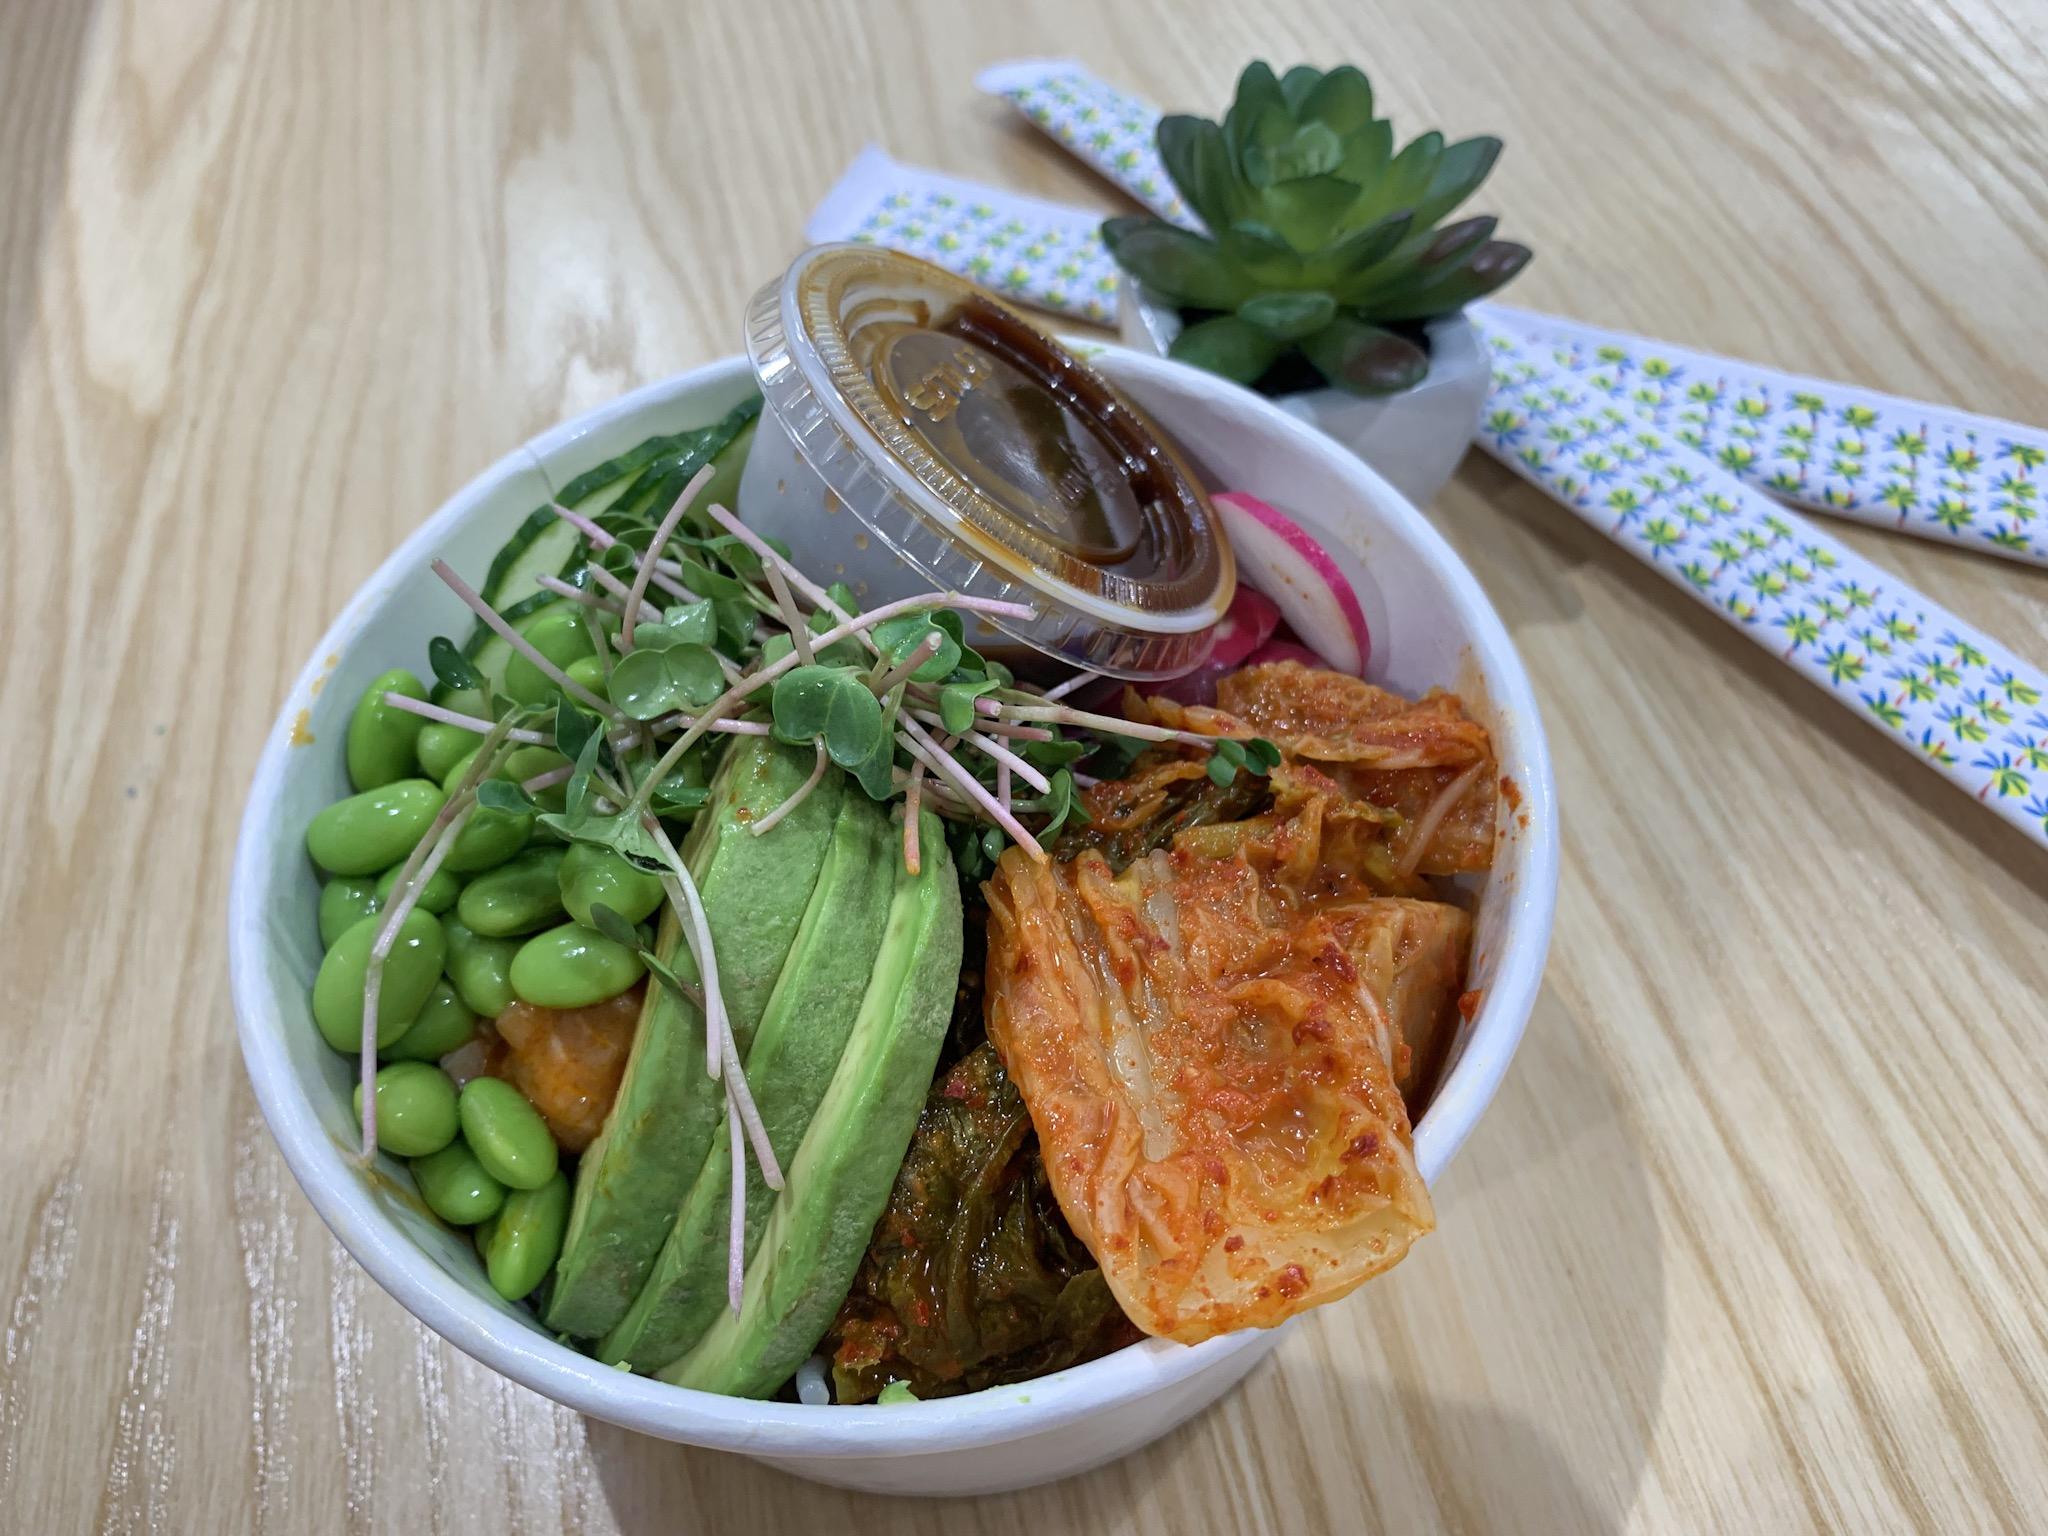 Custom Bowl with Spicy Tuna and Salmon, Avocado, Radish, Kimchi, Edamame and Micro-Greens